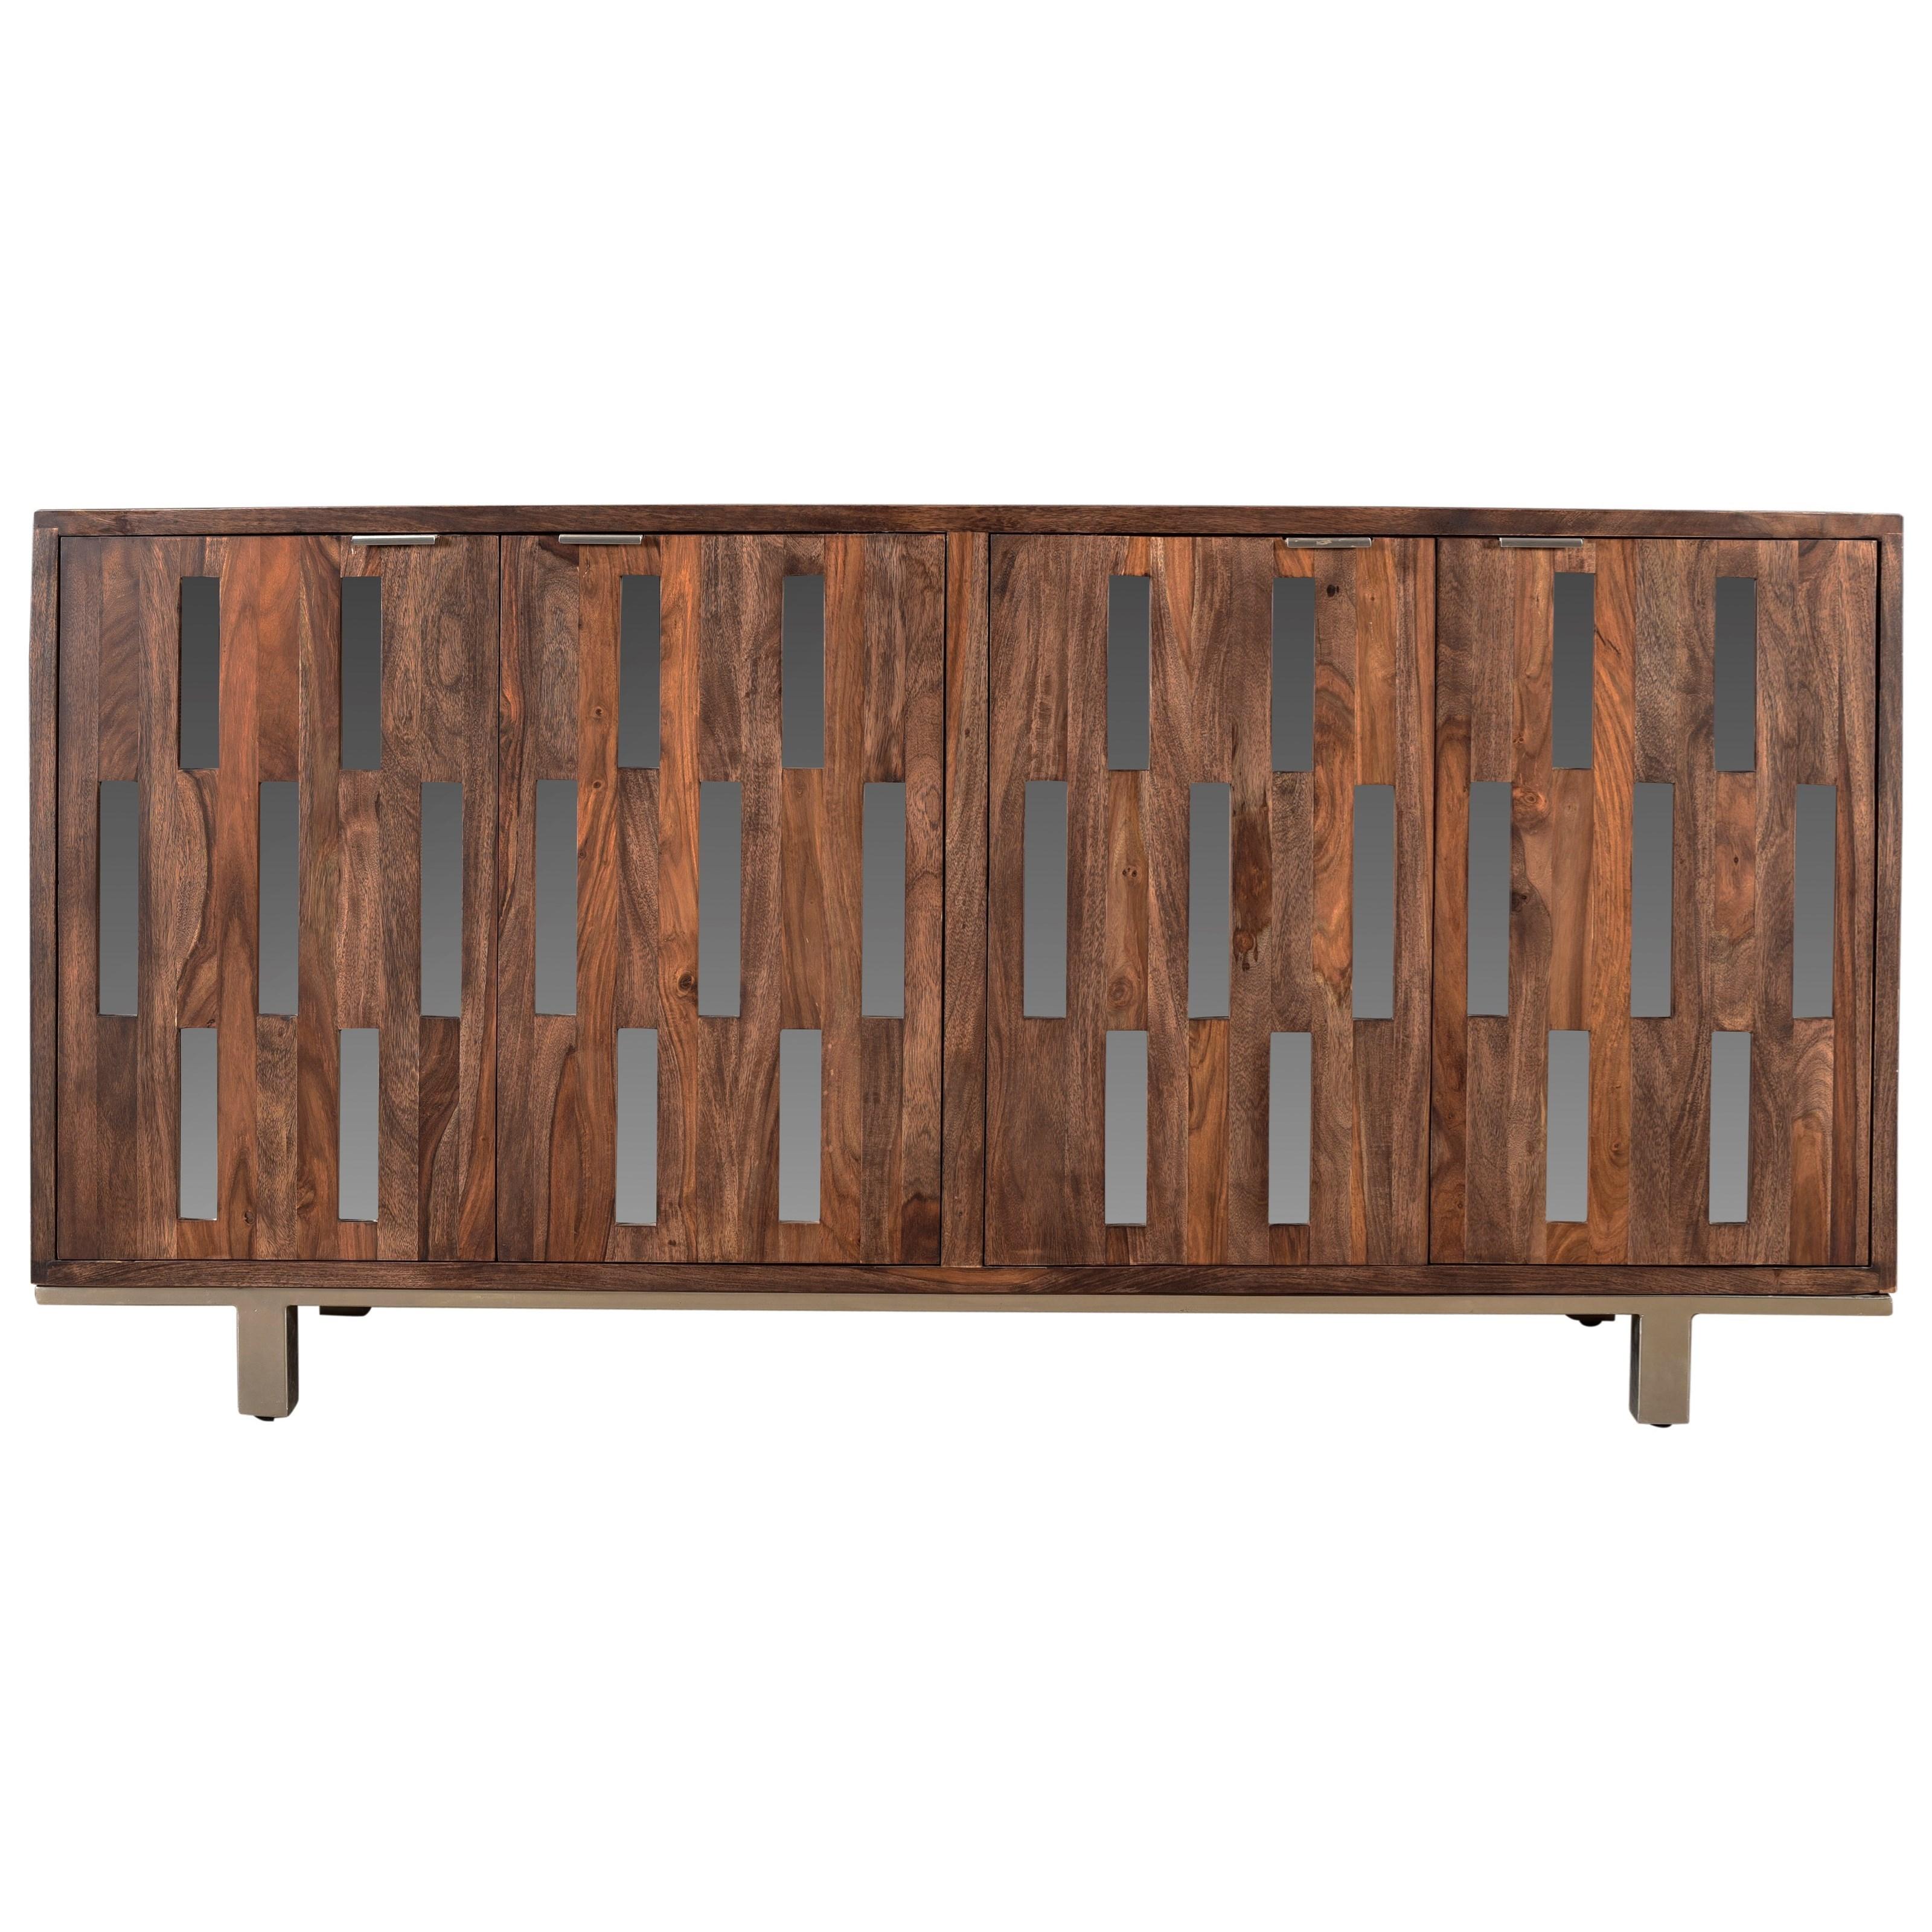 Gilliam Four Door Credenza by C2C at Walker's Furniture